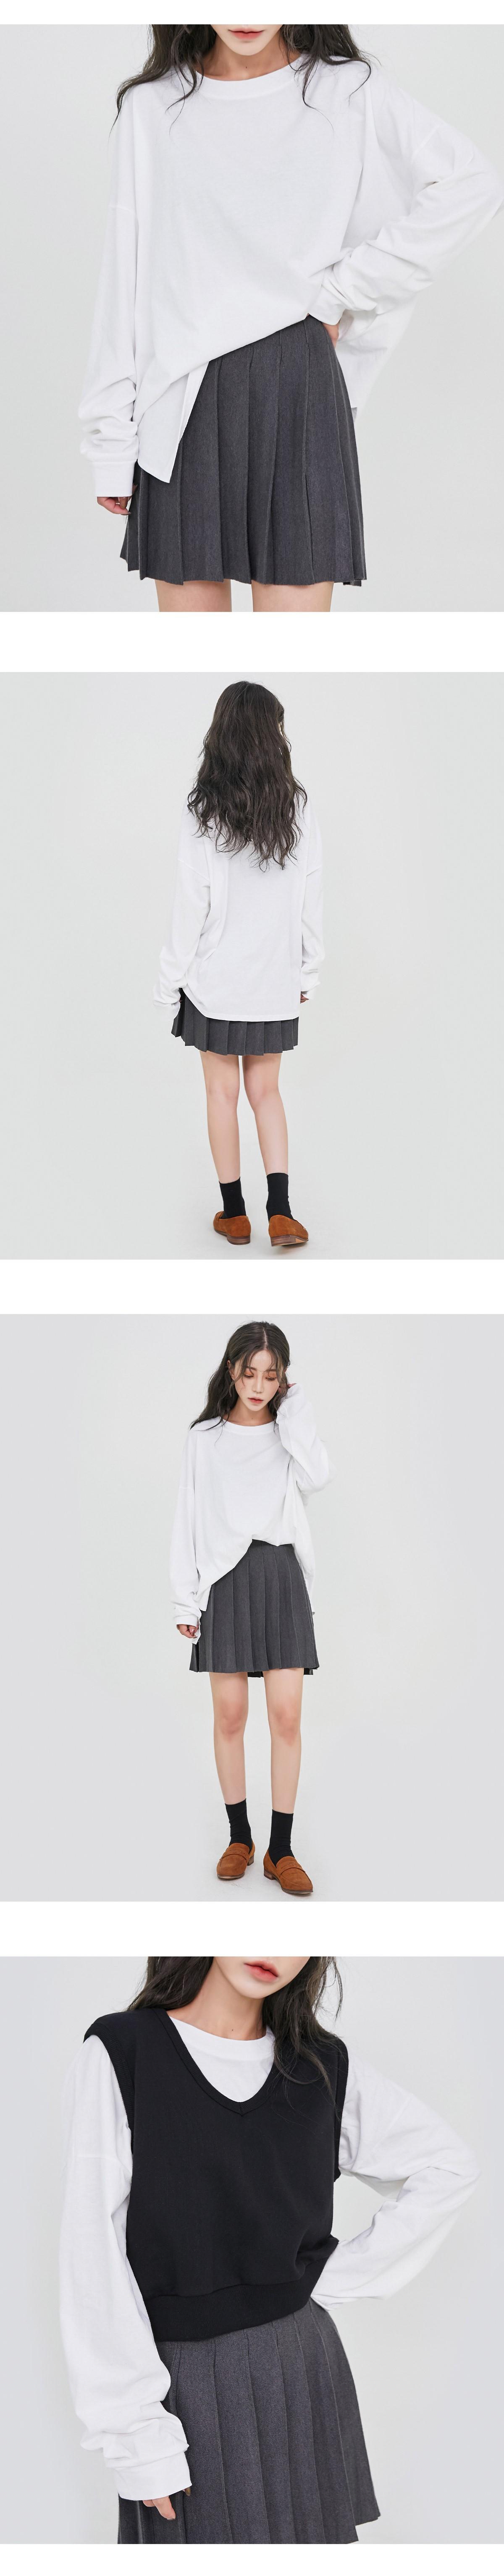 Wendy tennis skirt